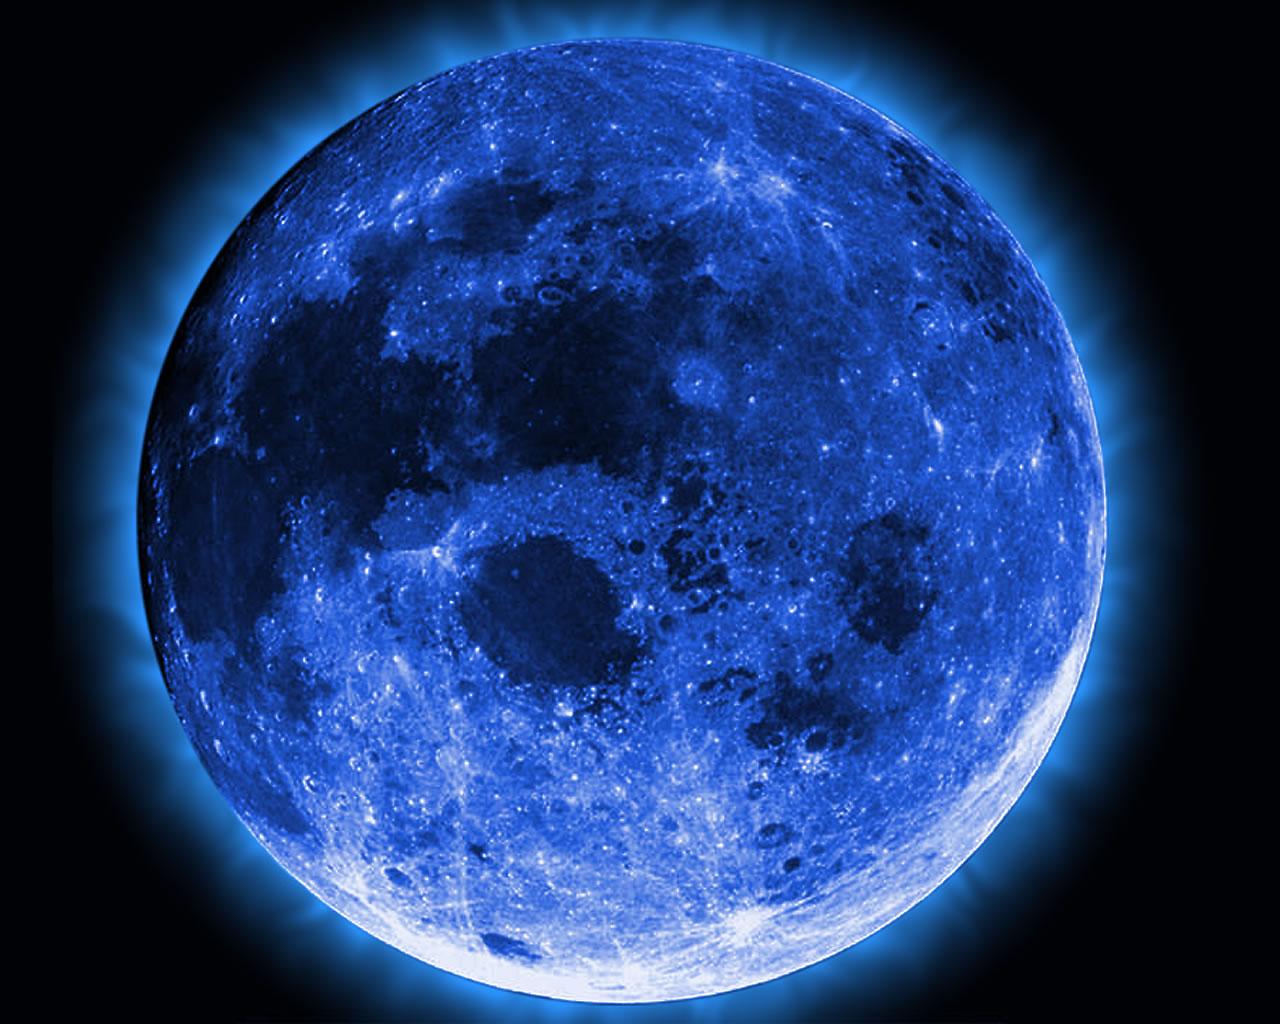 http://2.bp.blogspot.com/-hxJanD6cGlE/UBqE0JhEQUI/AAAAAAAAAOQ/NH6XcFHI2mU/s1600/bluemoon.jpg